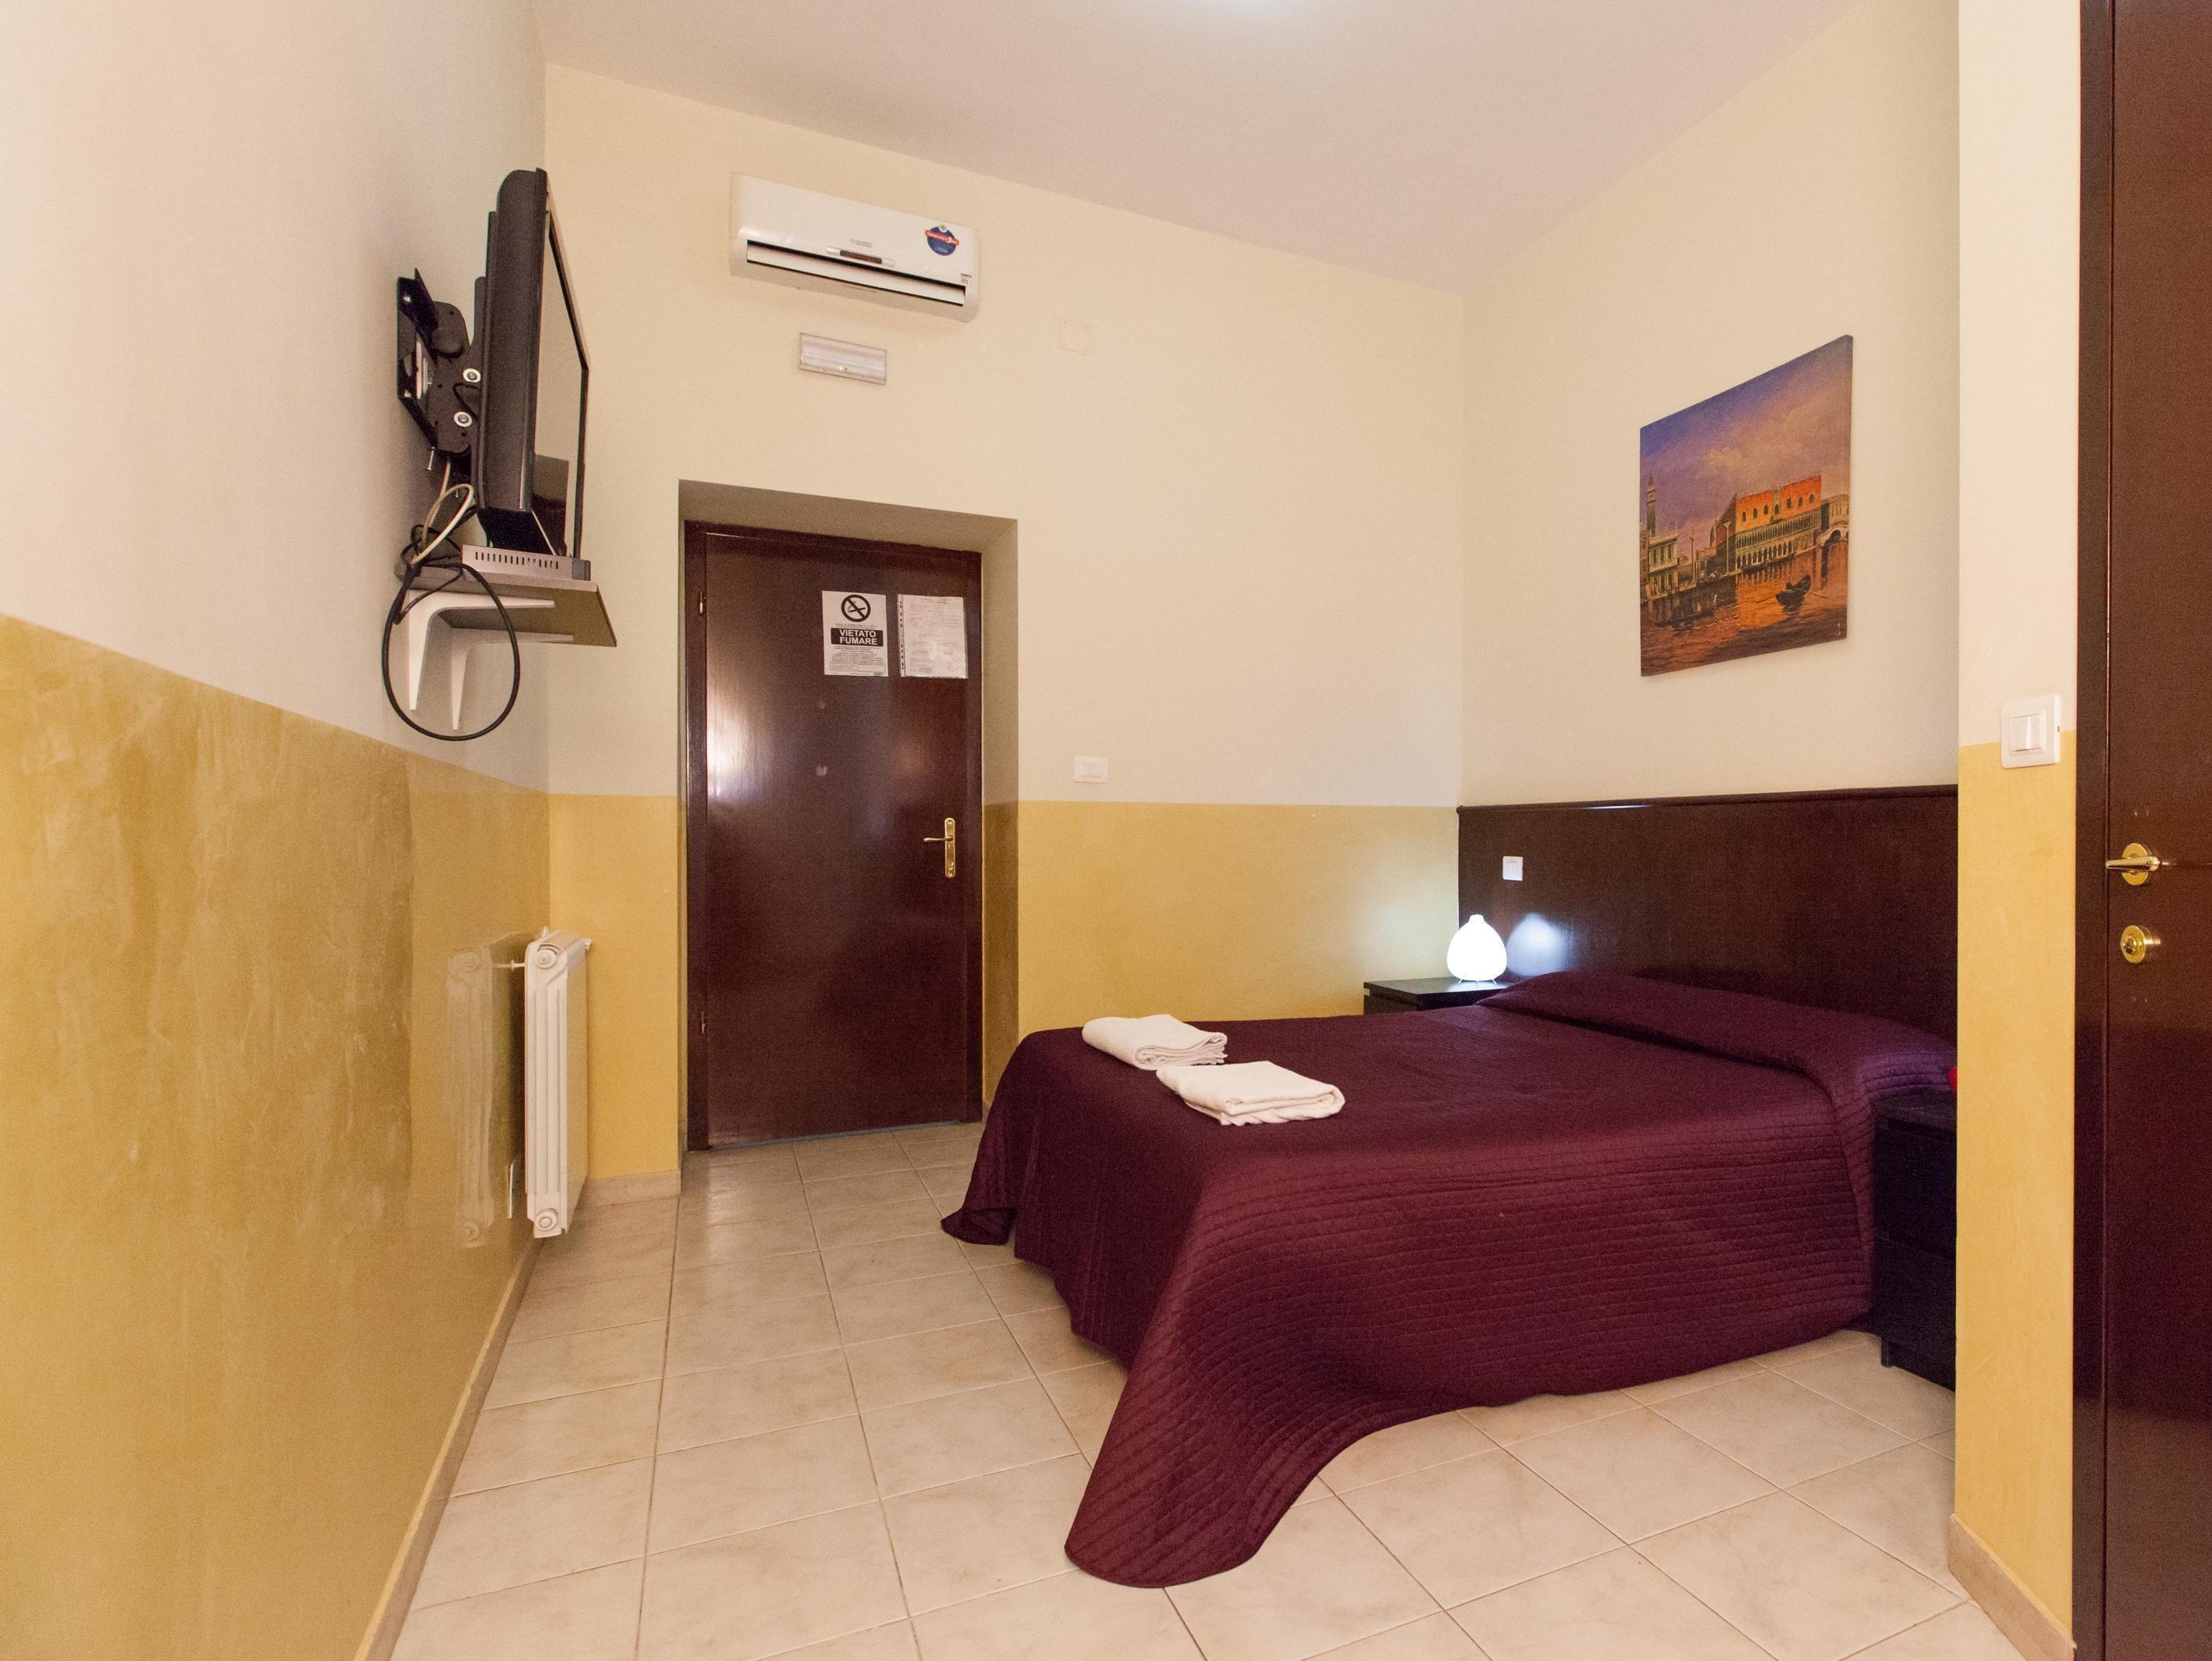 Friend House Hostel Rome, Italy